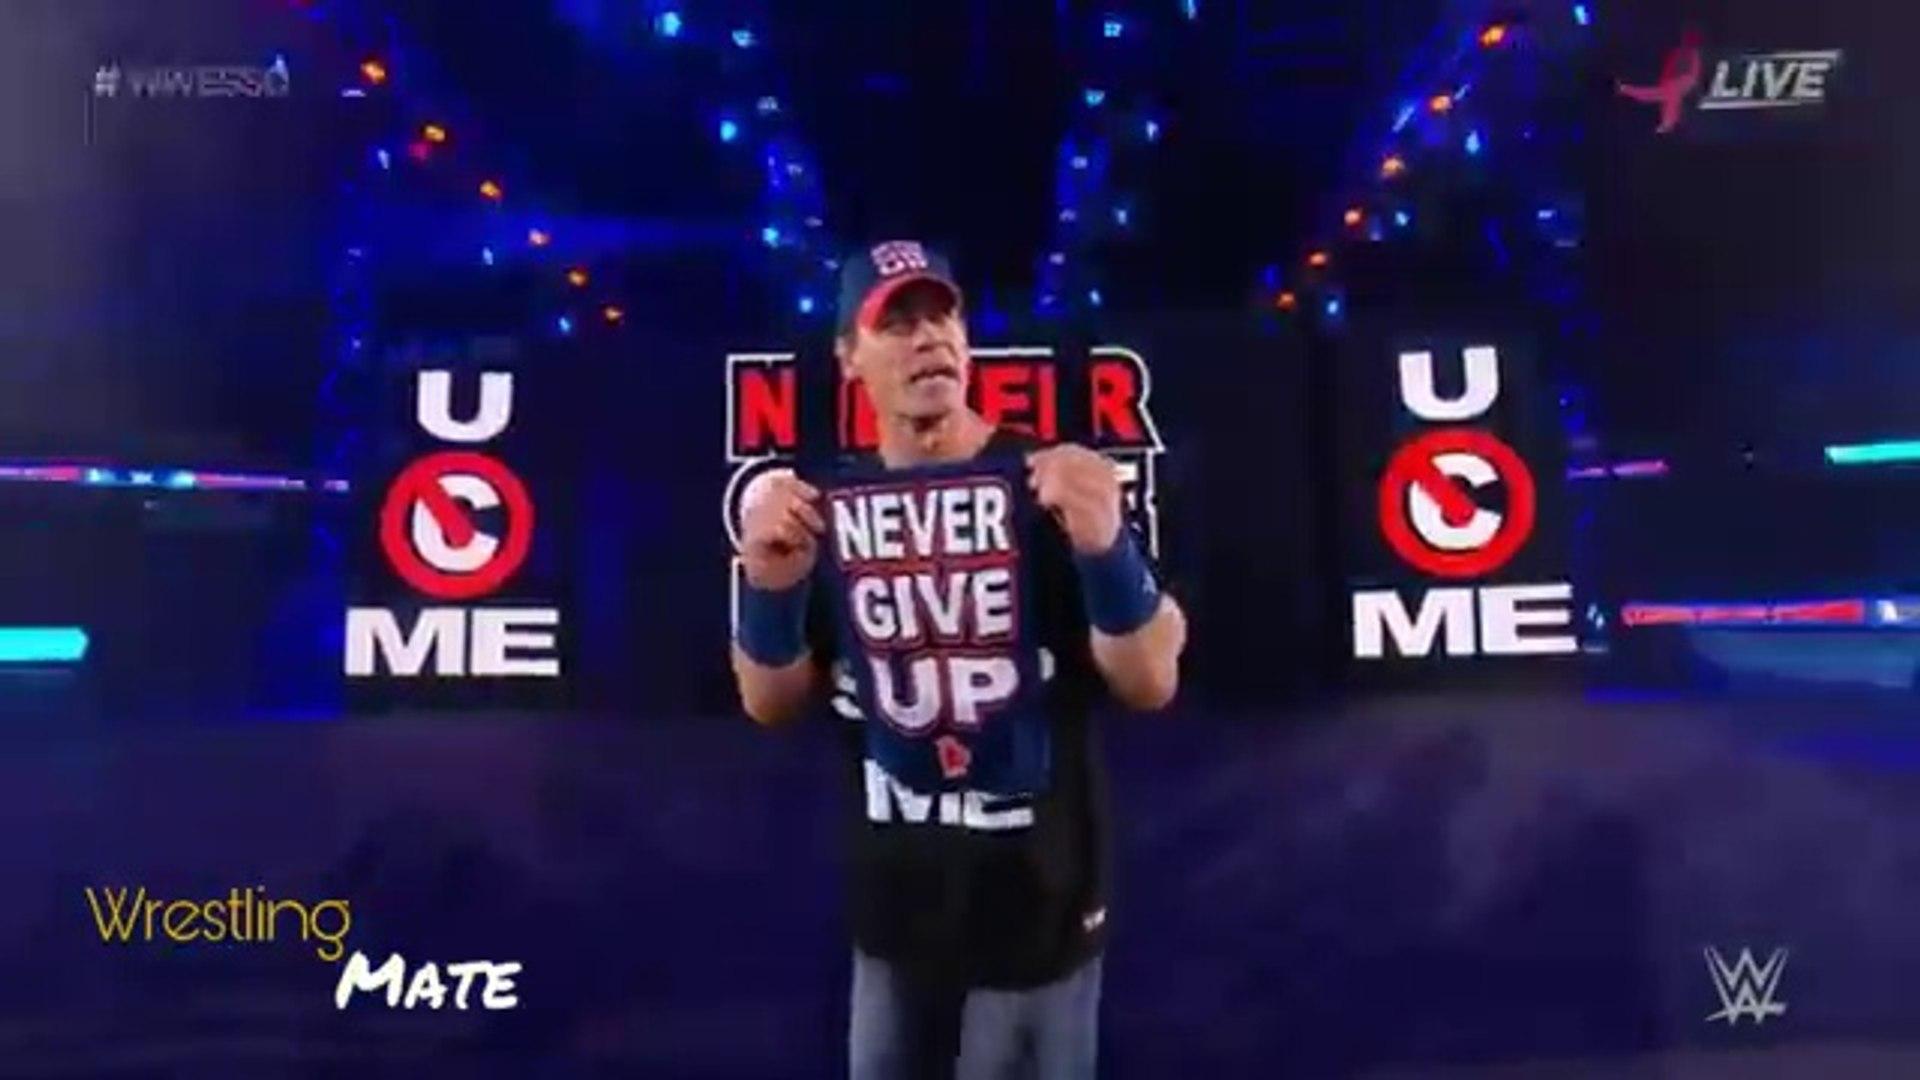 WWE Super Showdown 2018 Highlights HD - WWE Super Showdown 6th October 2018 Highlights